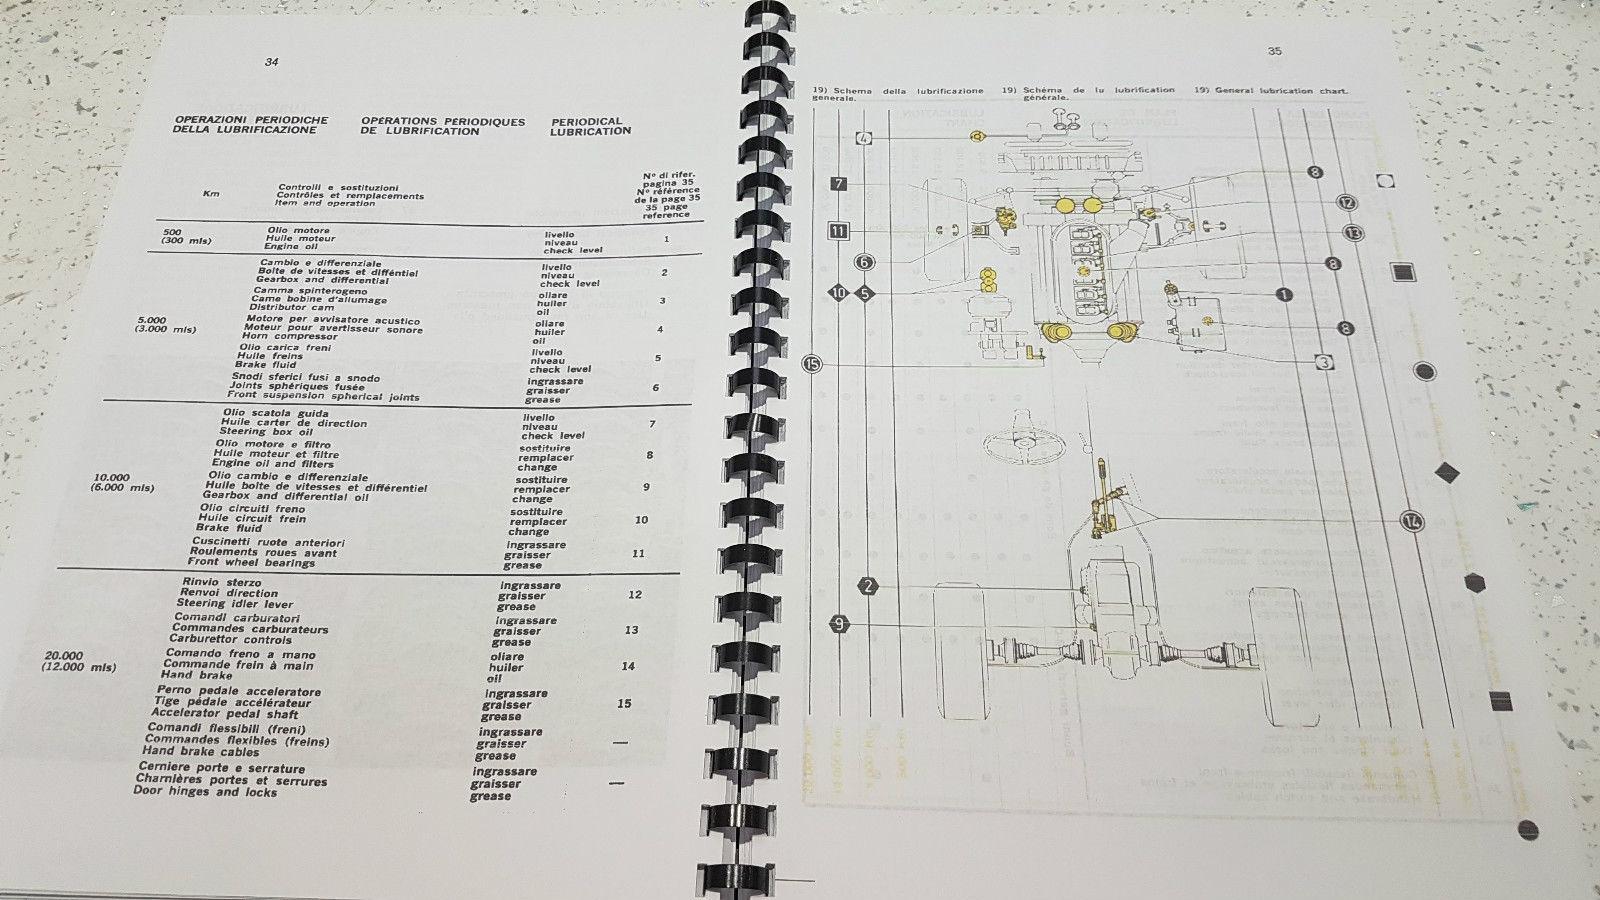 FERRARI 365 GTB//4 OPERATING MAINTENANCE /& SERVICE BOOK REPRINTED A4 COMB BOUND